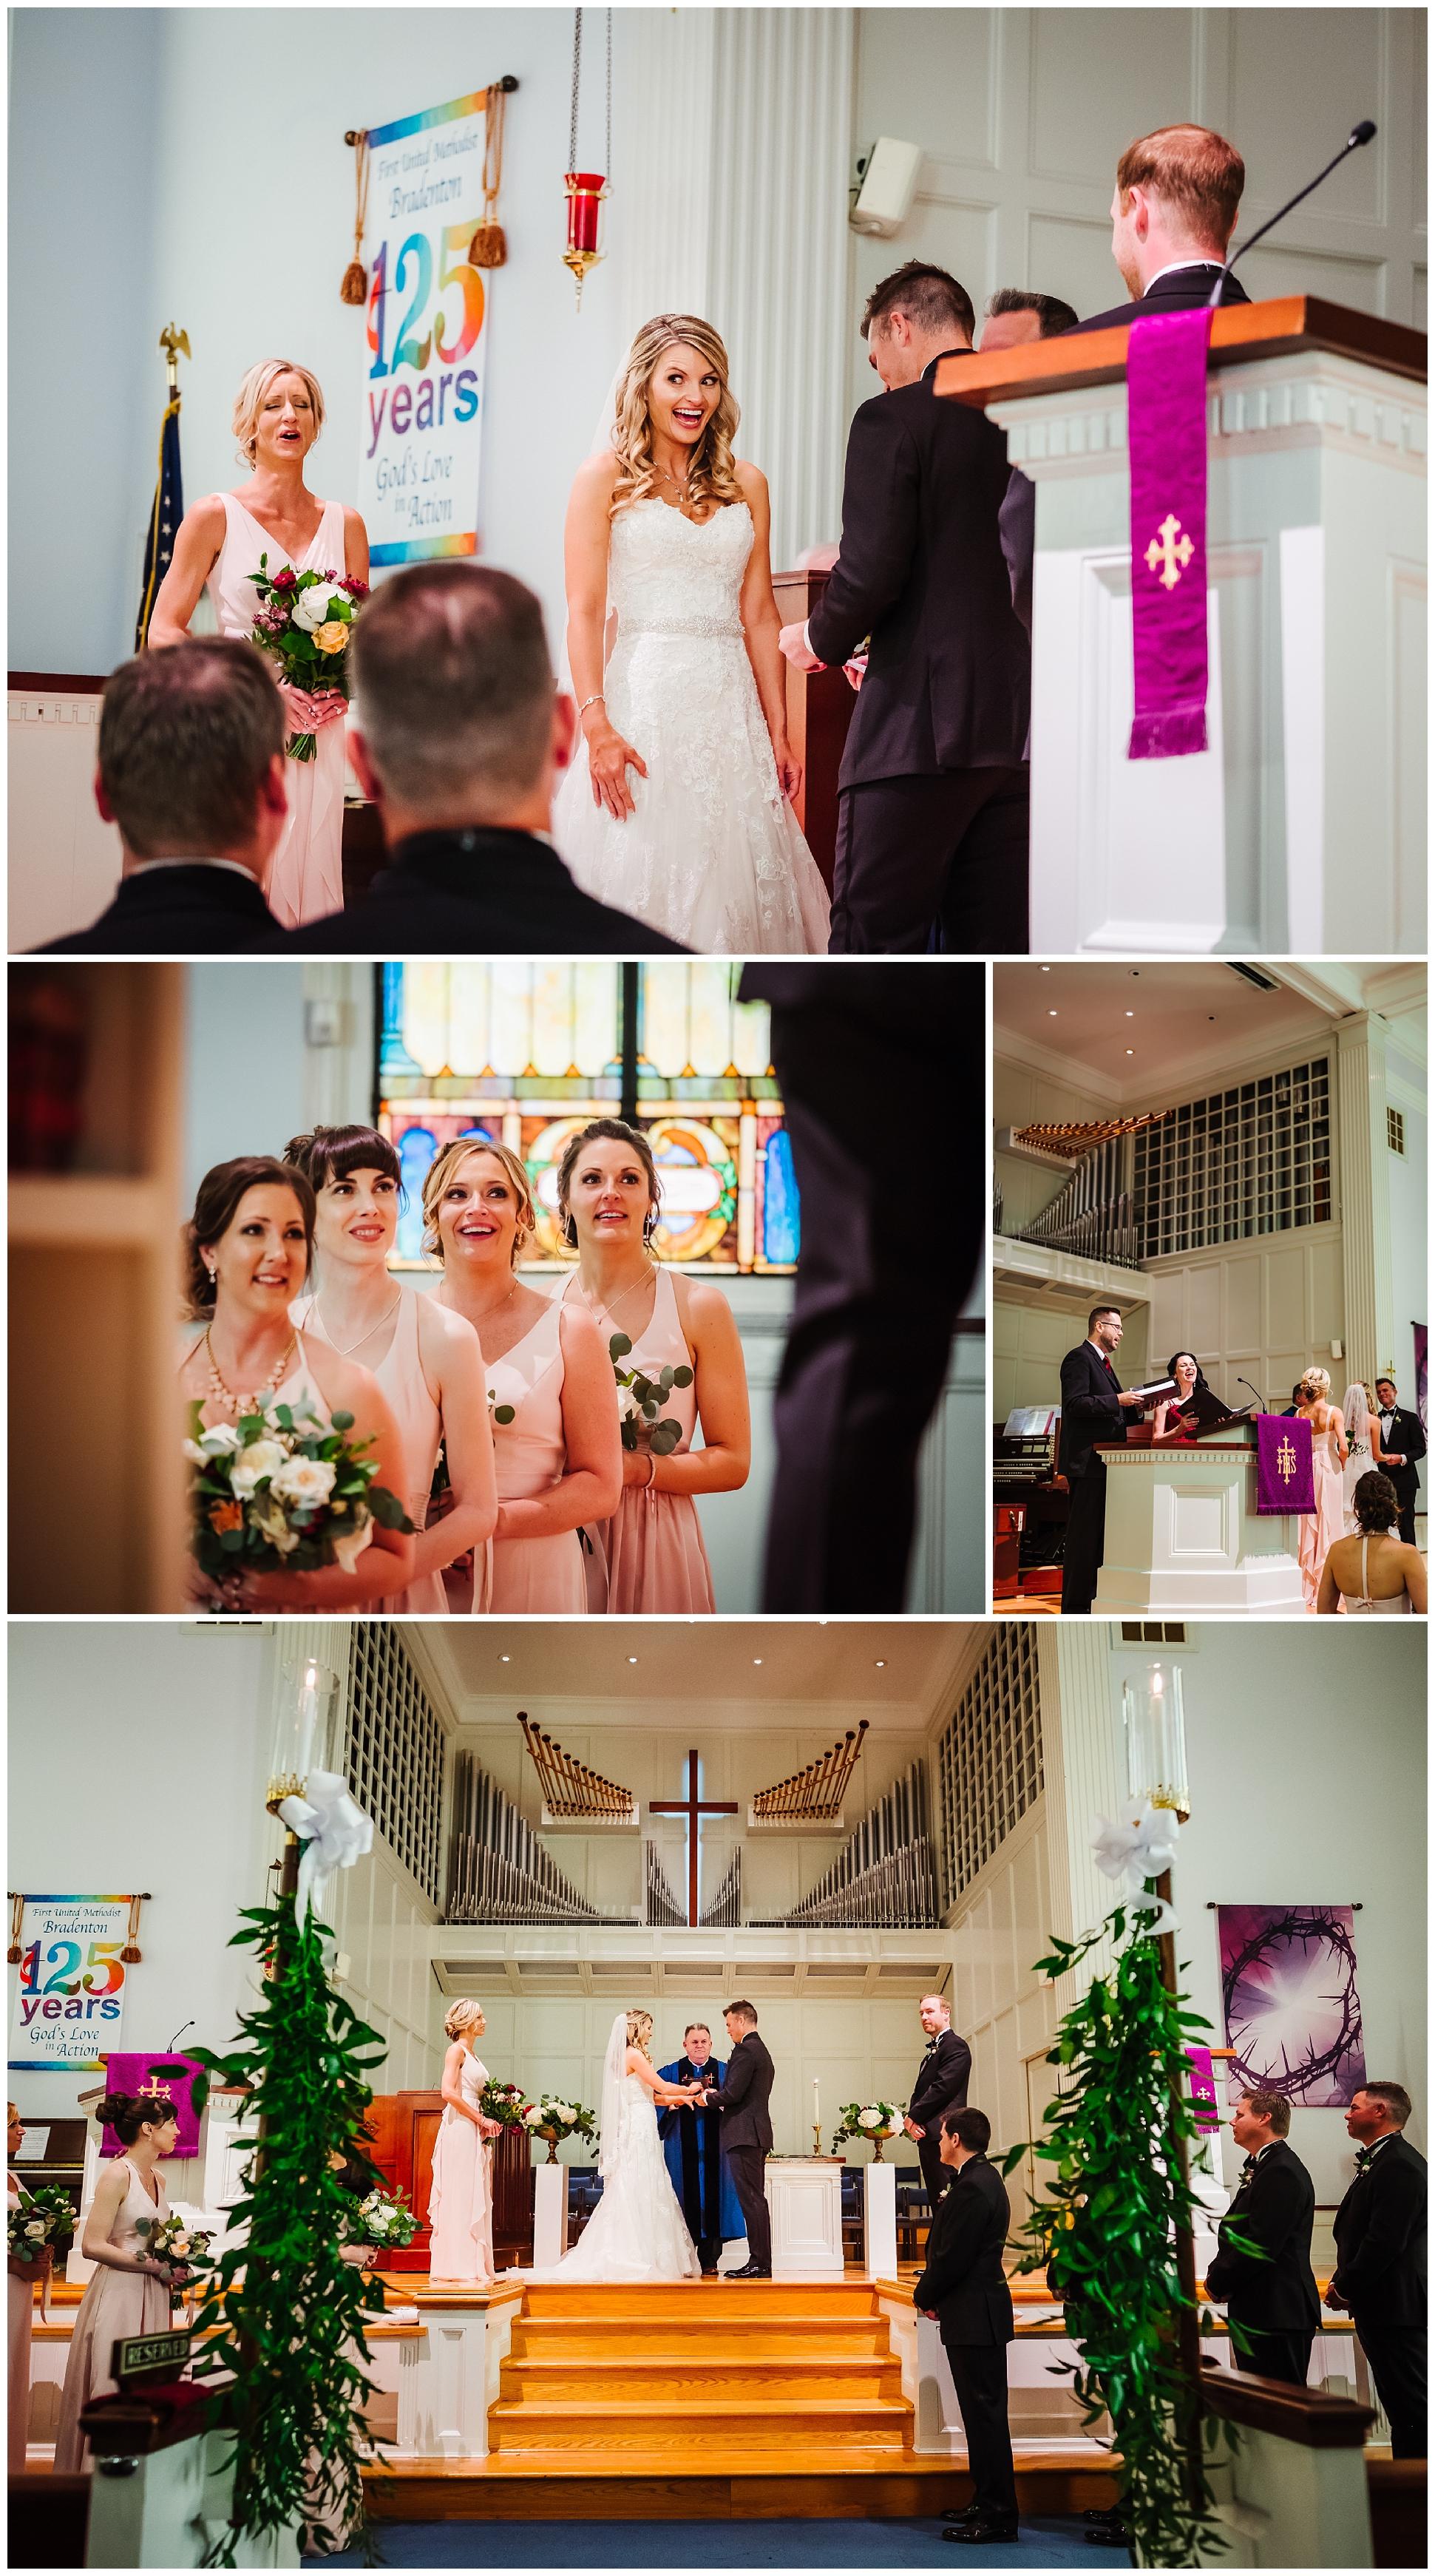 tampa-bradenton-wedding-photographer-south-florida-museum-classic-blush-gold-alpacas-sparklers_0052.jpg